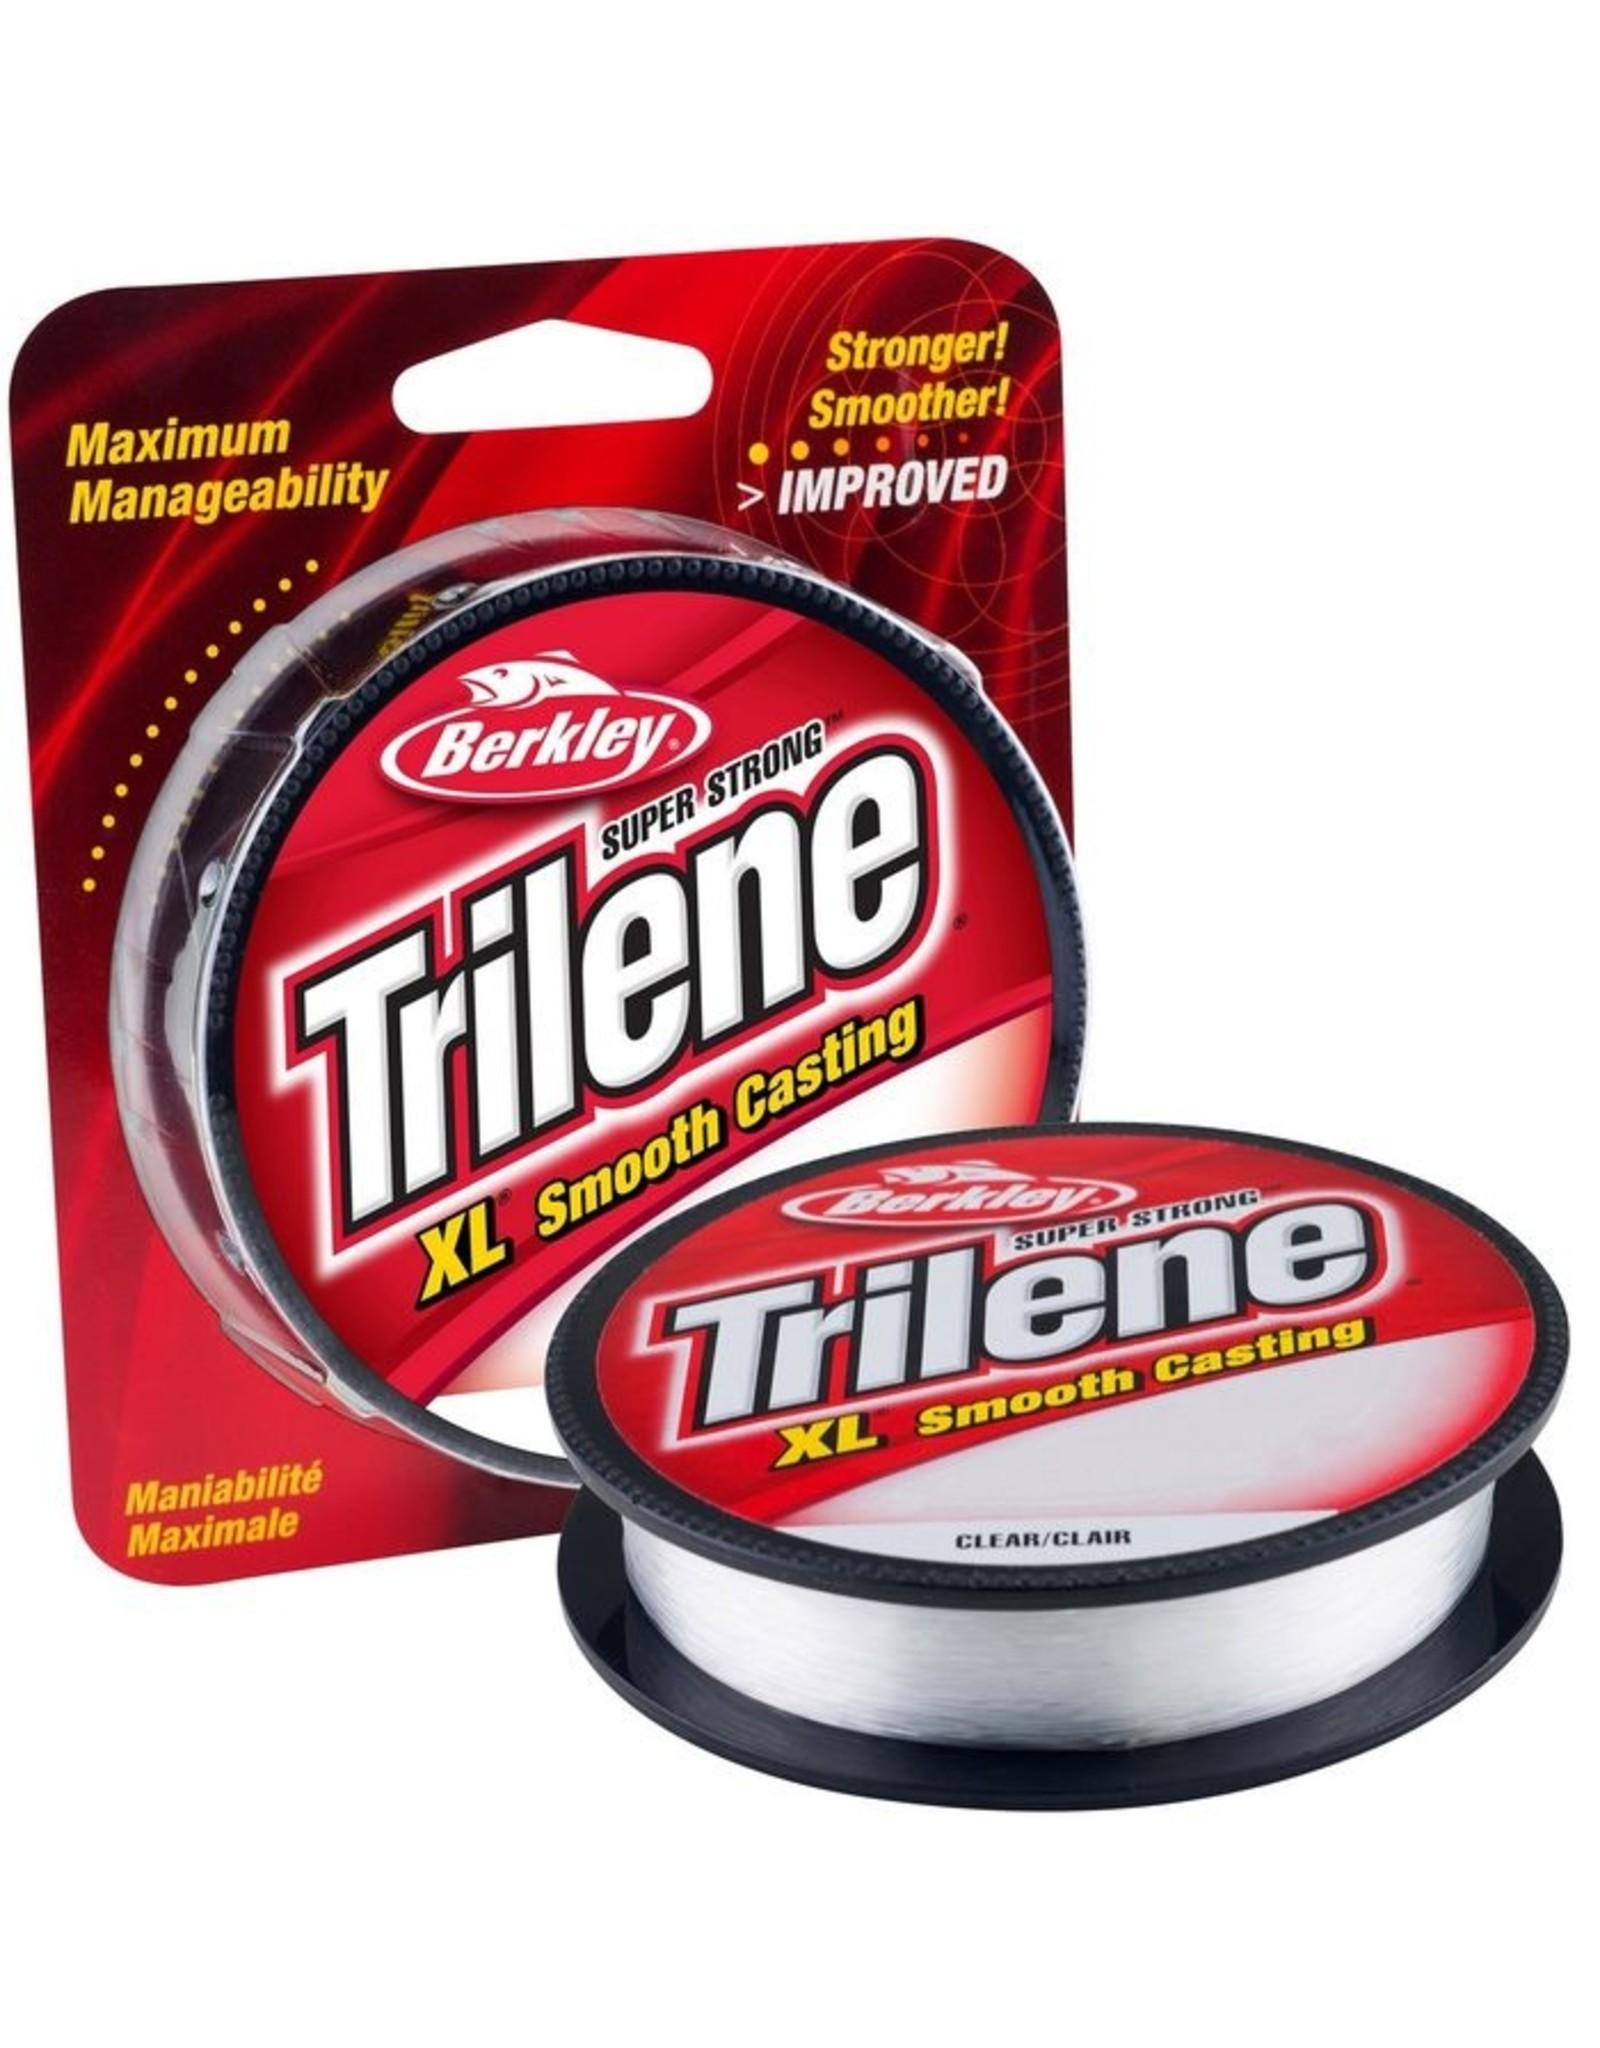 Berkley Trilene  xl smooth casting